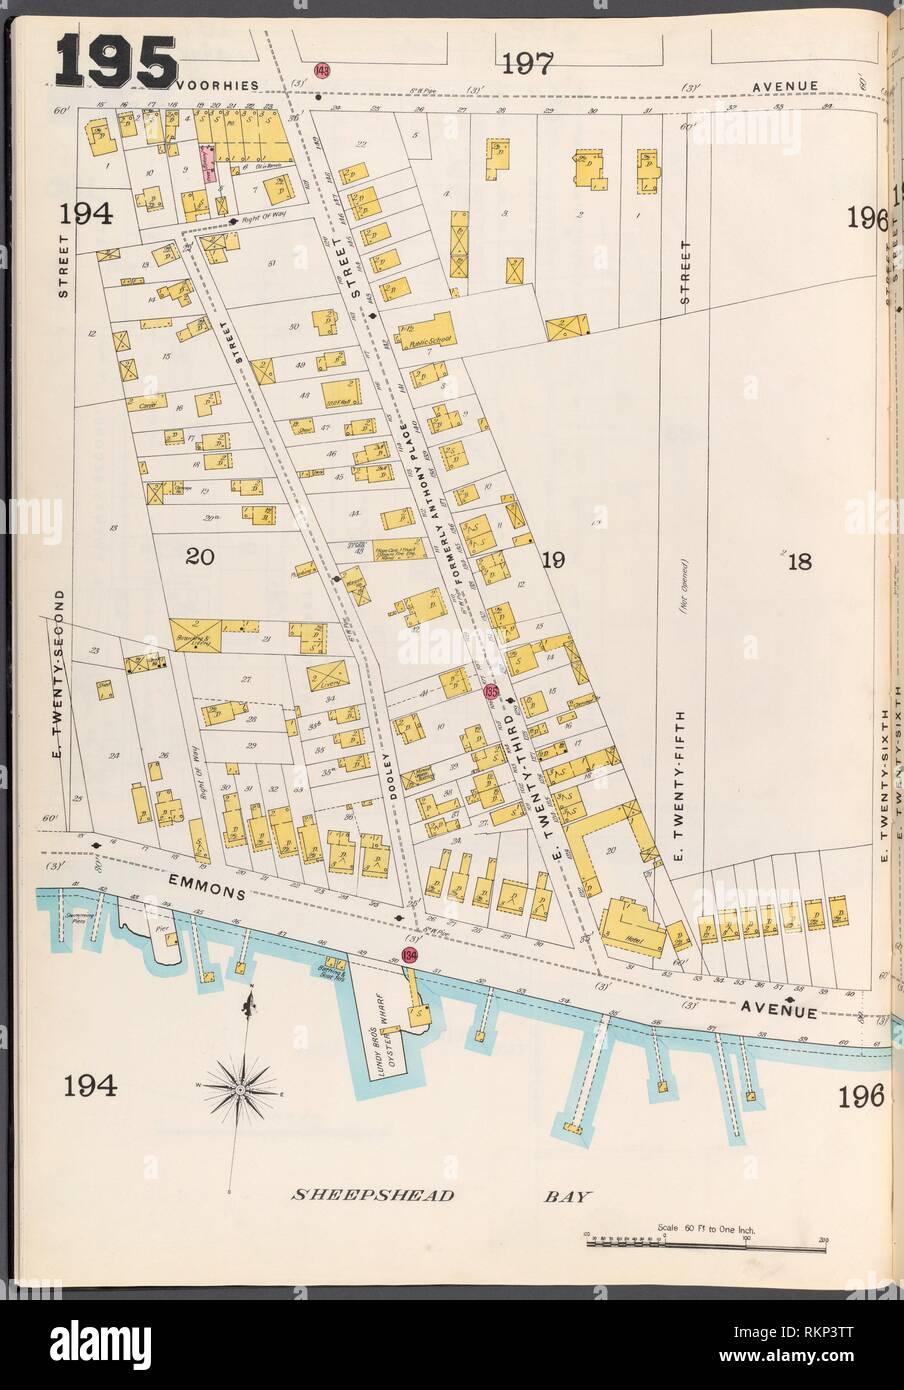 Subway Map Sheepshead Bay.Brooklyn Sheepshead Bay Stock Photos Brooklyn Sheepshead Bay Stock